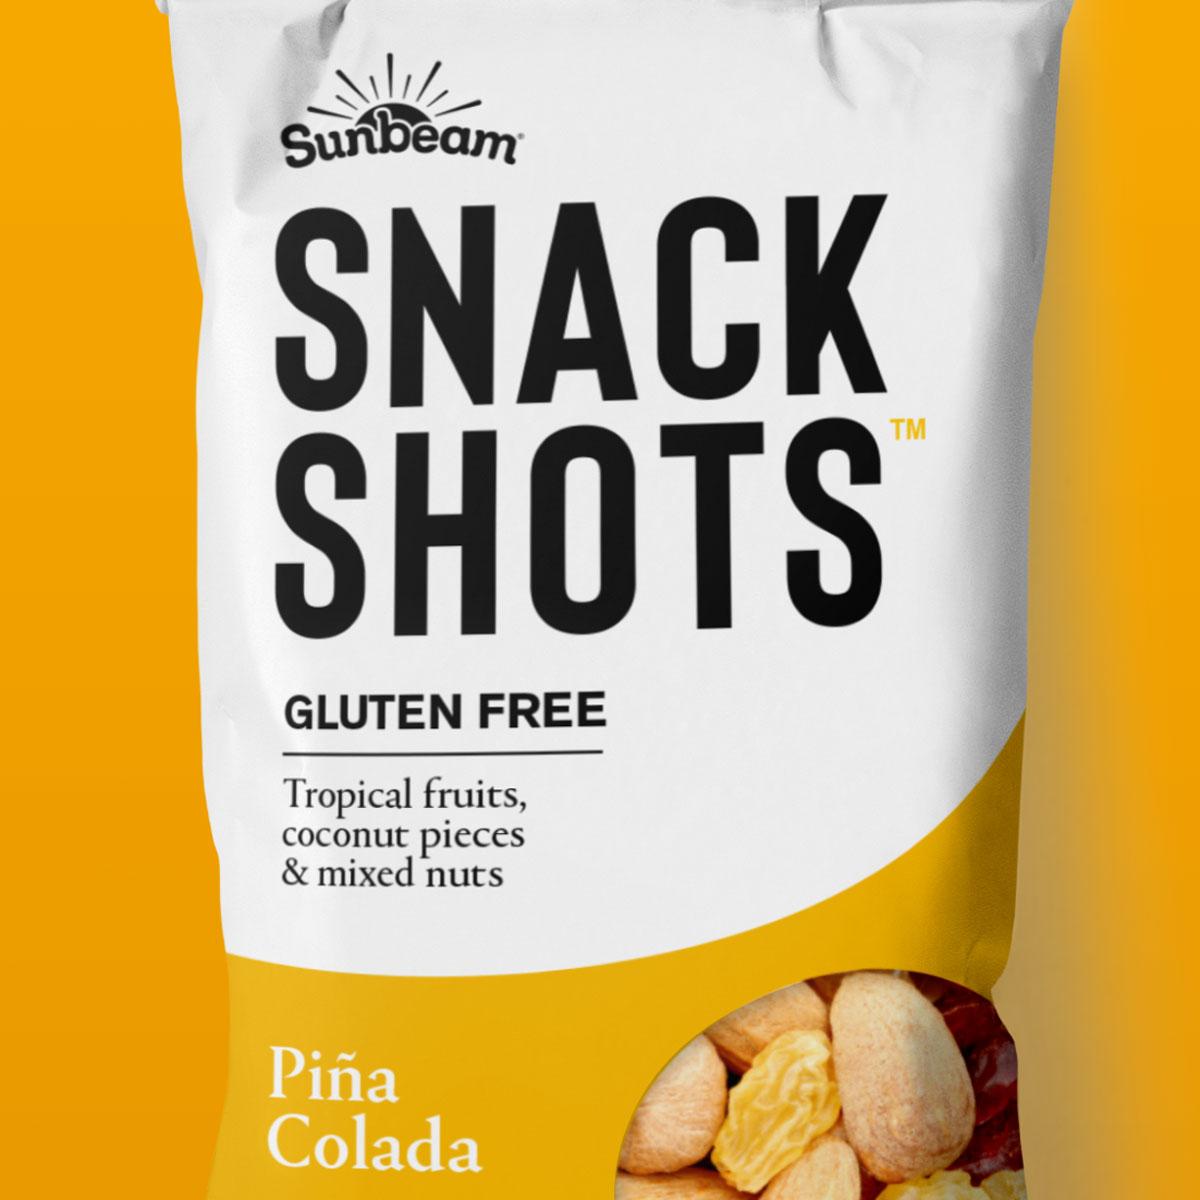 snack shots pina colada on yellow